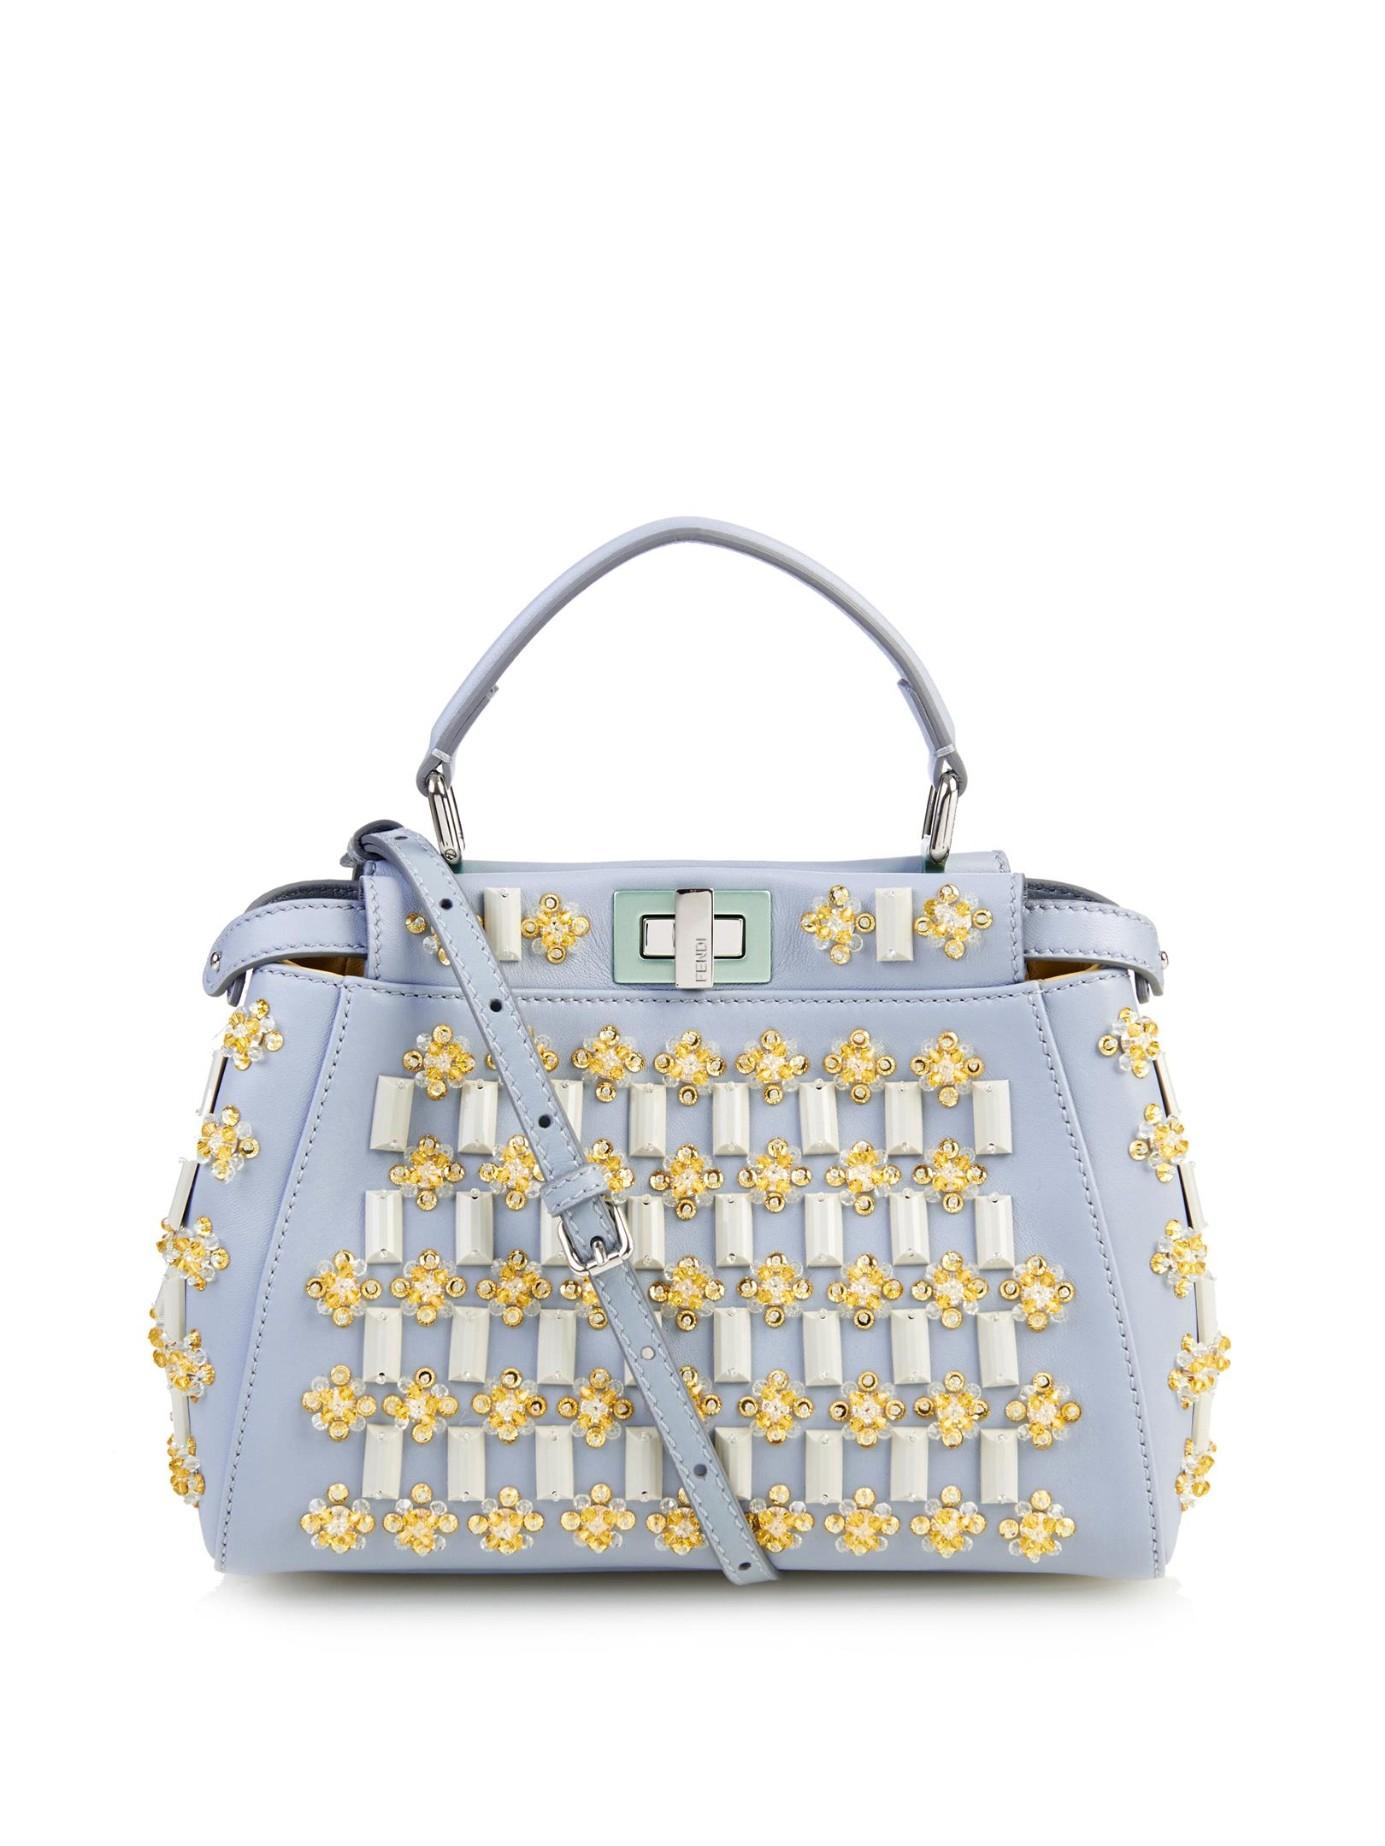 Fendi Mini Peekaboo Floral-Embellishments Cross-Body Bag in Blue - Lyst a942955cdbef9